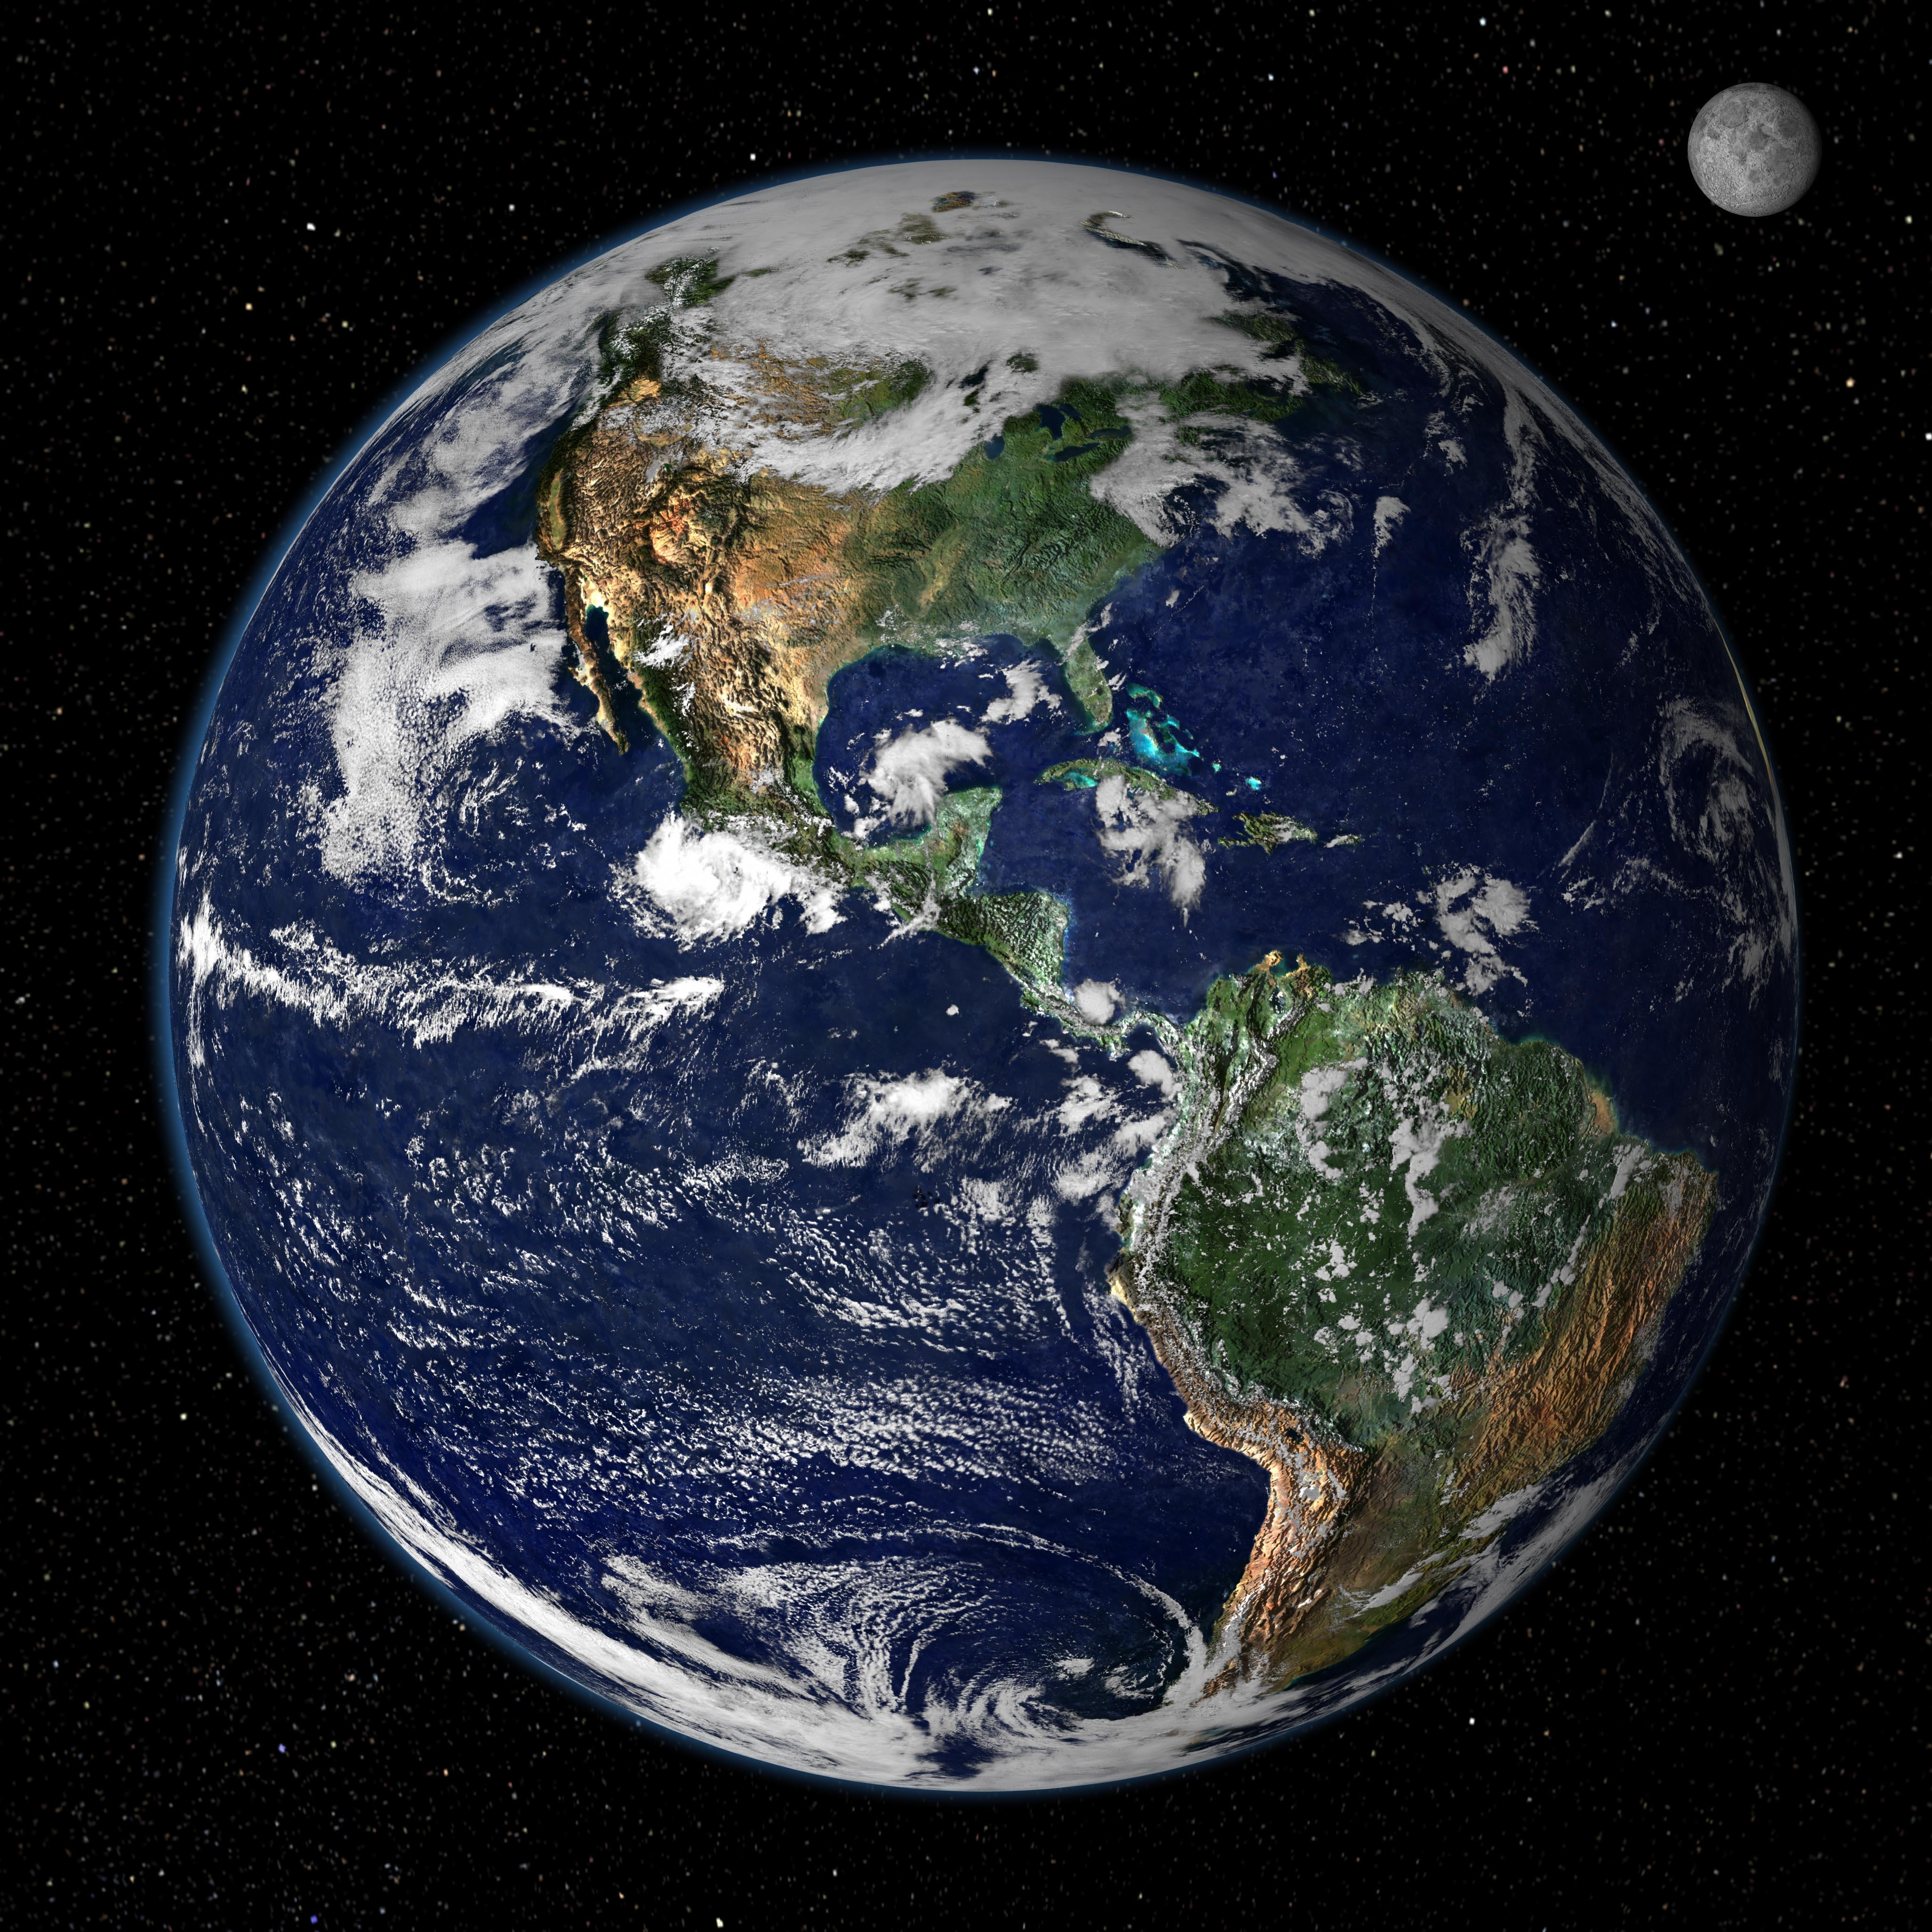 NASA Earth Observatory 4096x4096